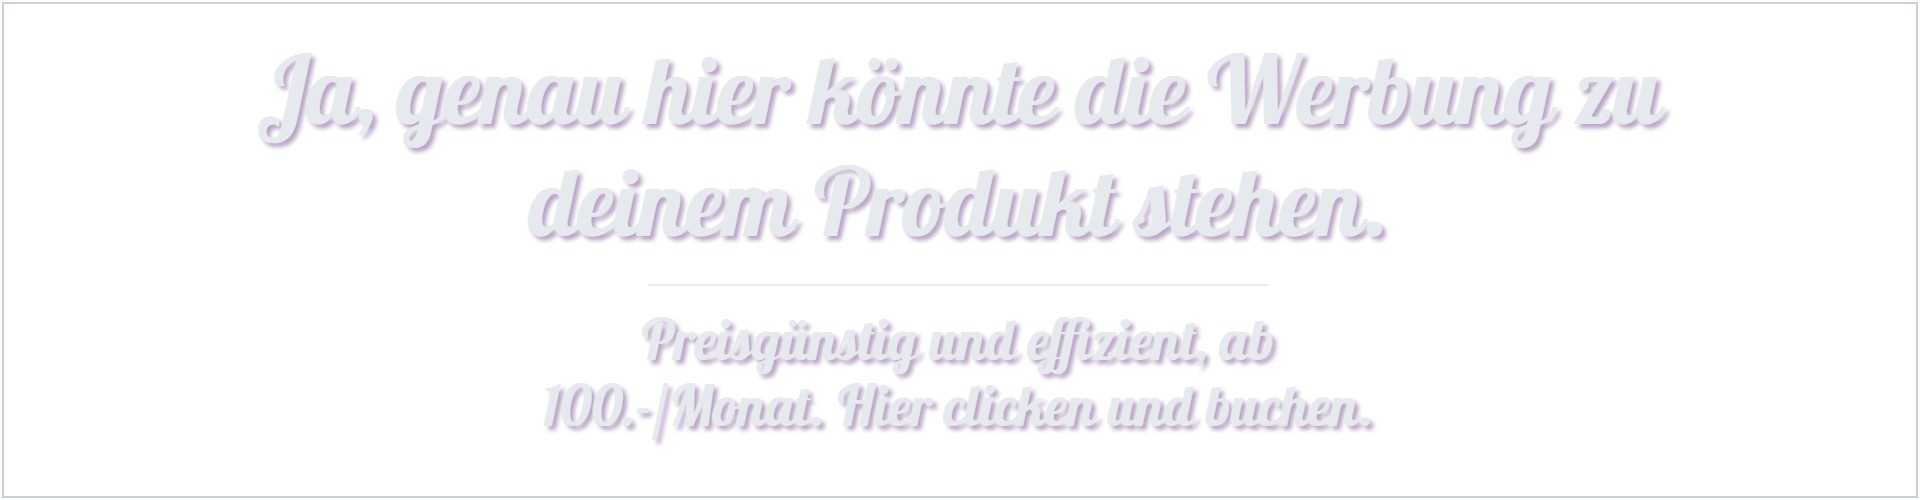 Werbung auf Qurs.ch